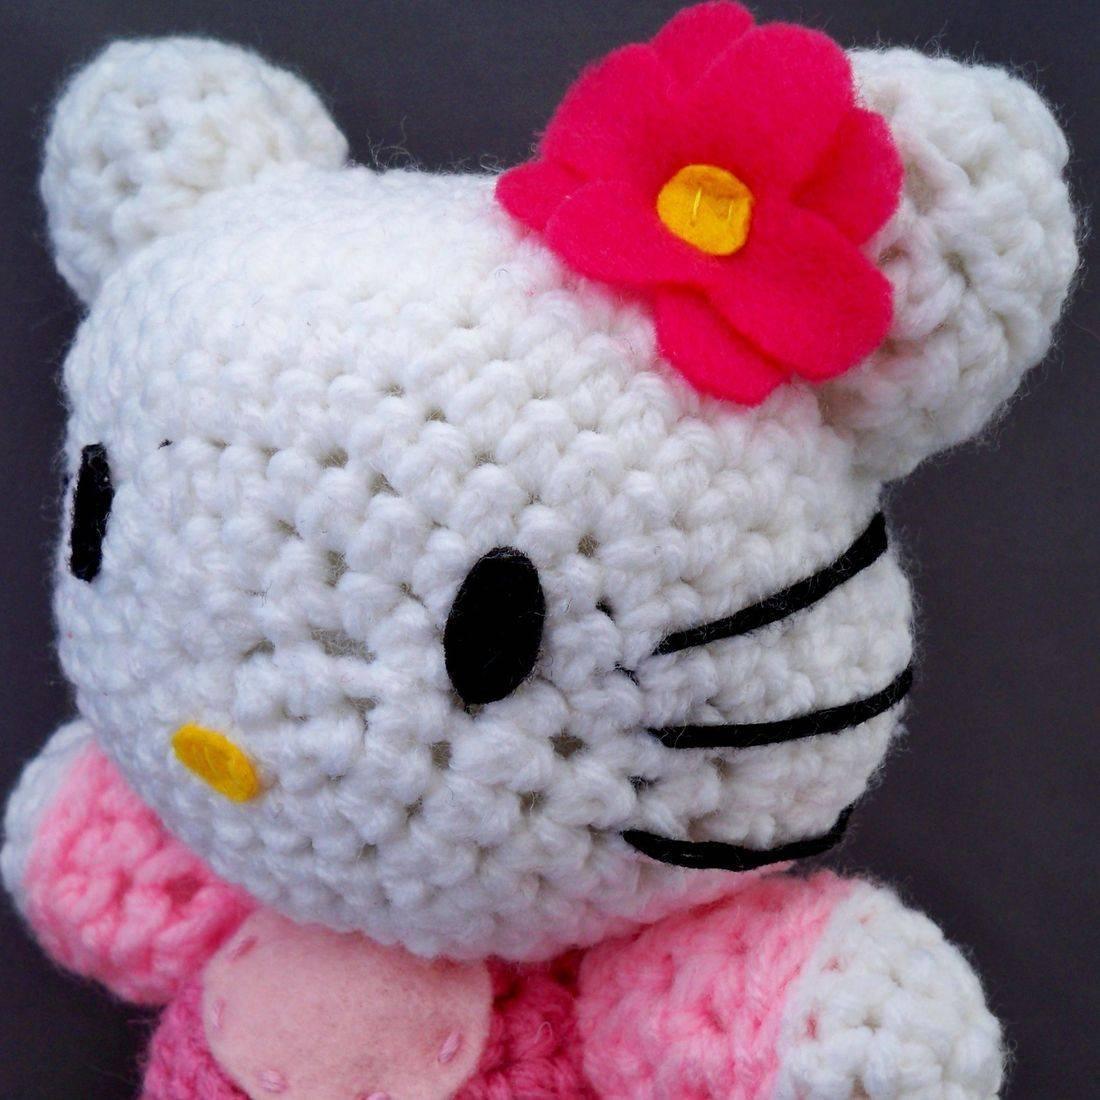 Hello Kitty, HK, Japan, Japanese, feline, anime, otaku, nerd, geek, crochet, amigurumi, plush, doll, pink